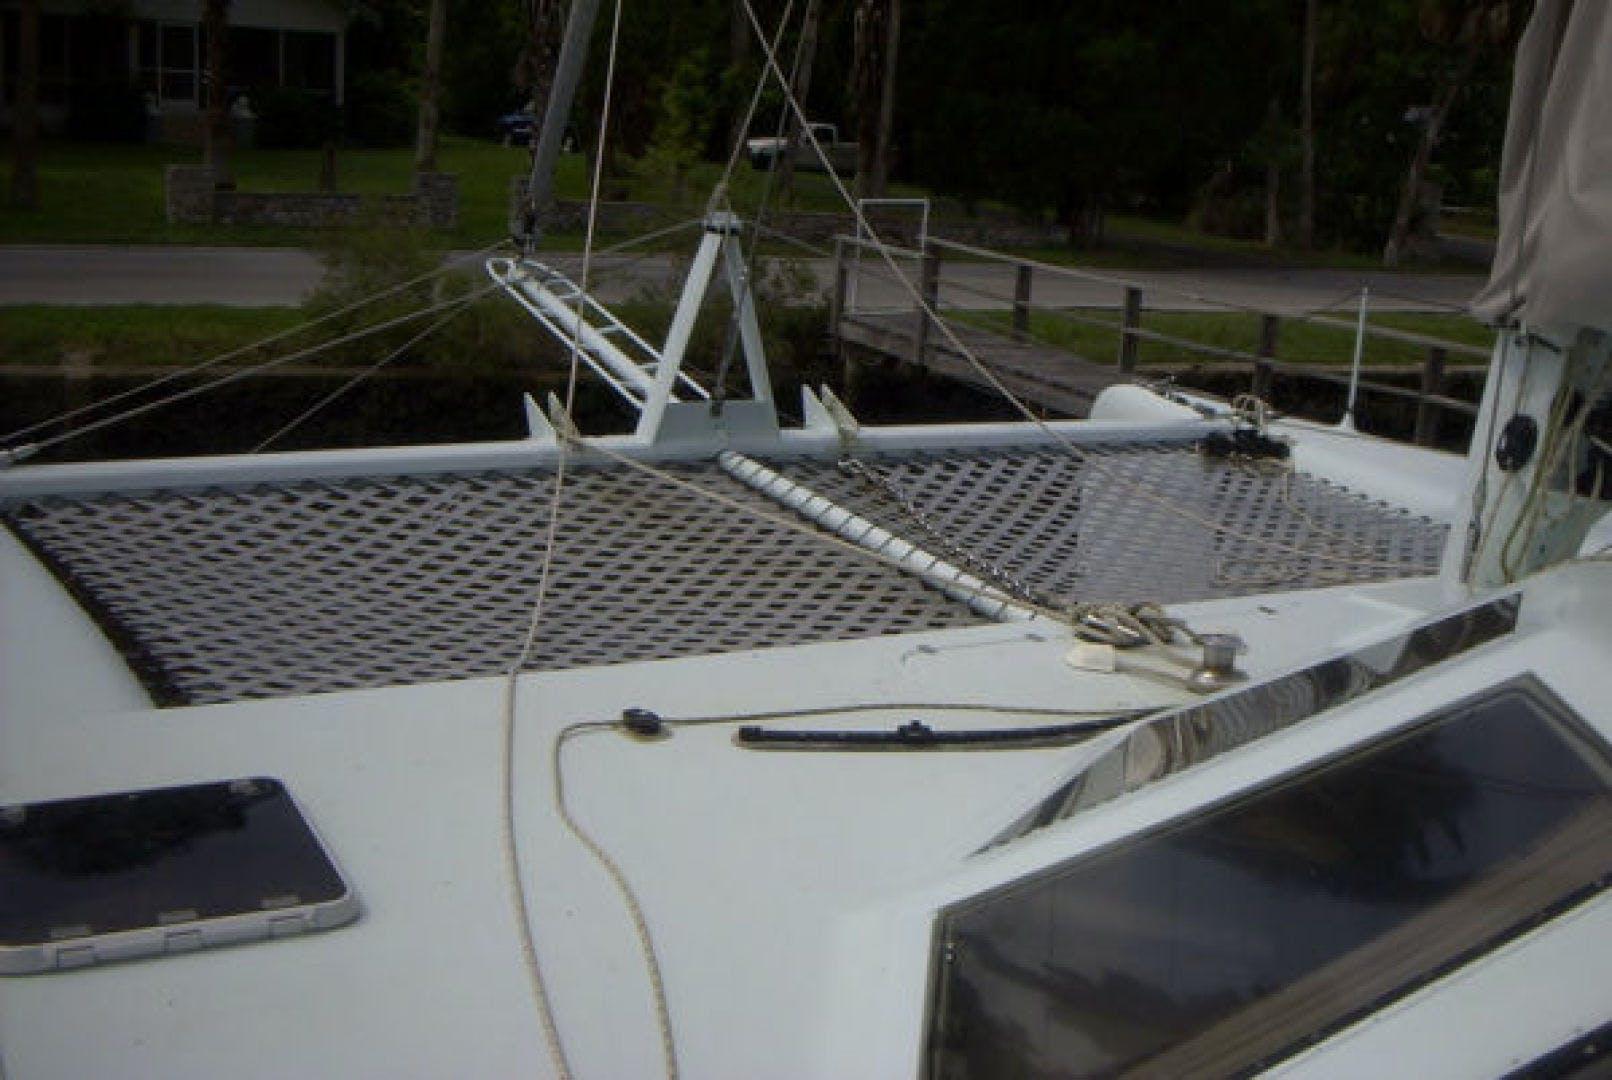 1999 Catamaran Custom Commercial Term Charter 60' Catamaran 60 No Name | Picture 3 of 16